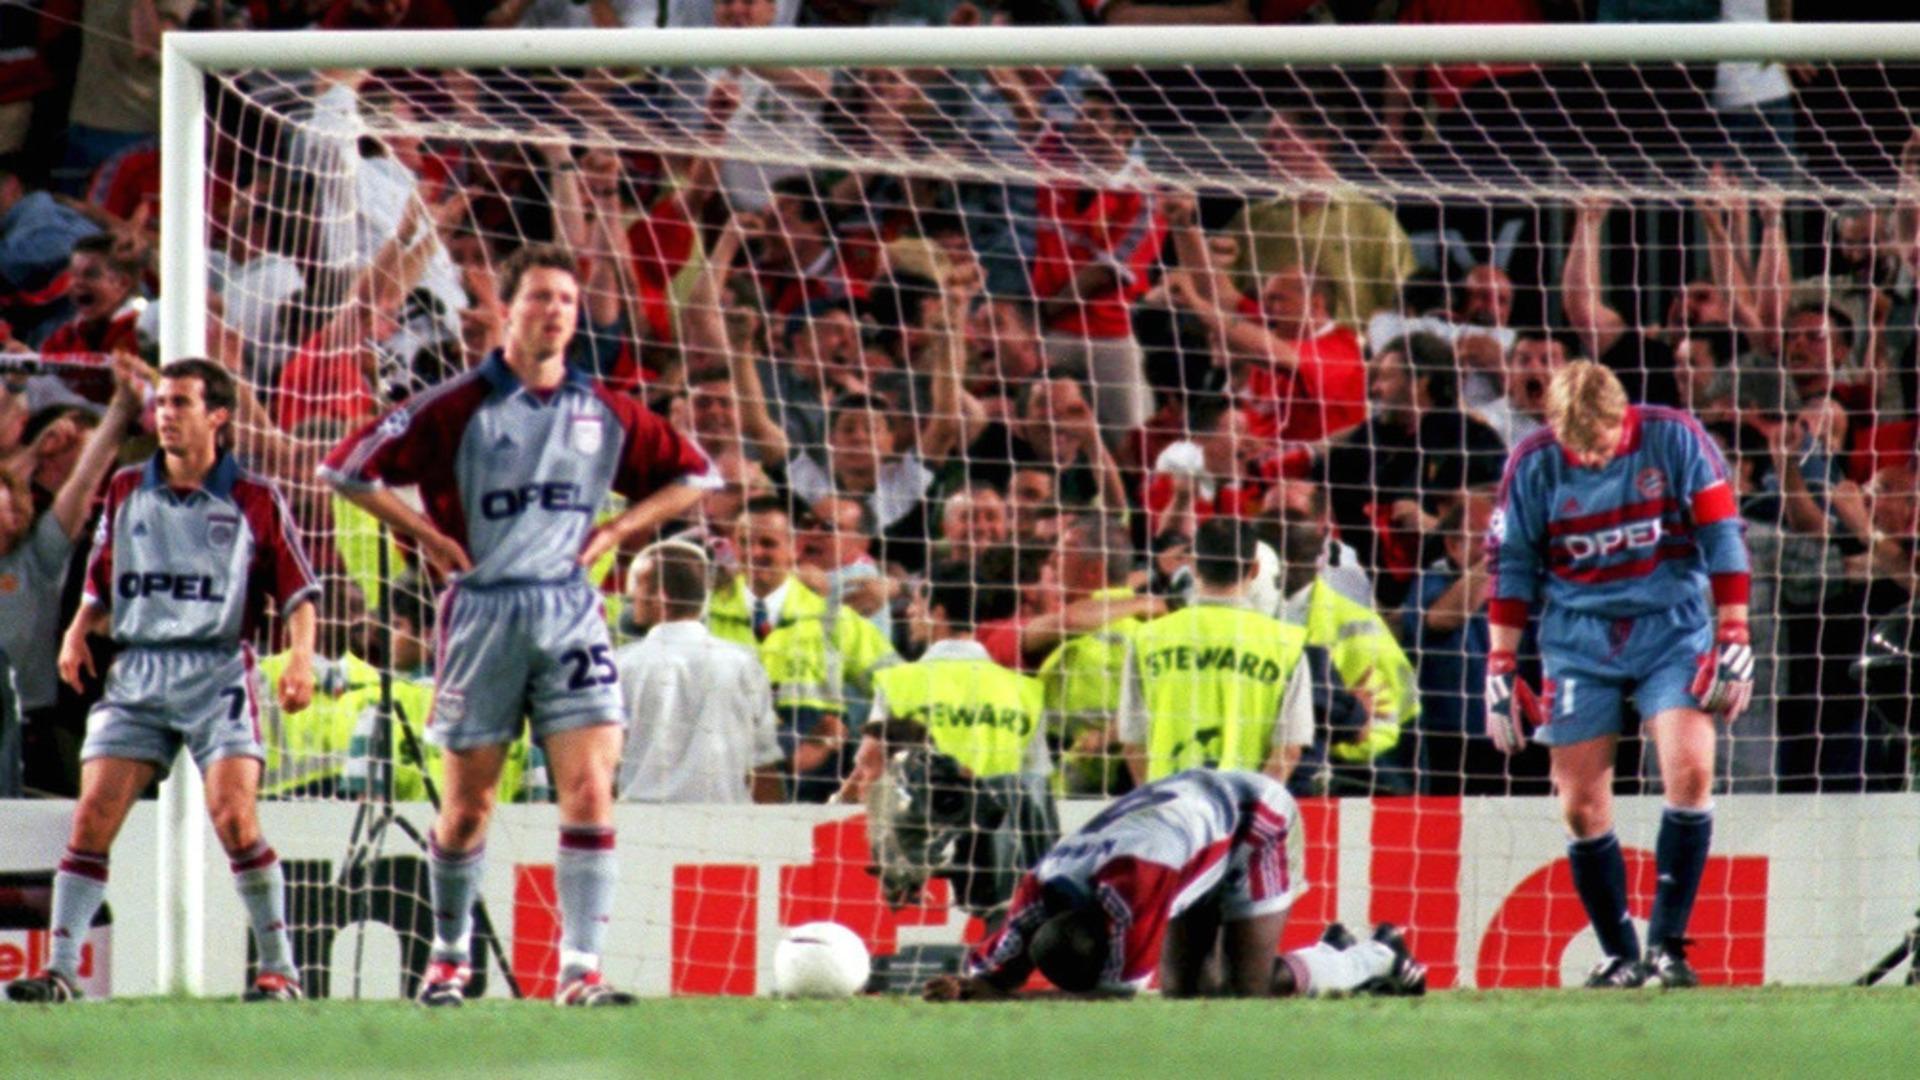 Sammy Kuffour 1999 UCL Final